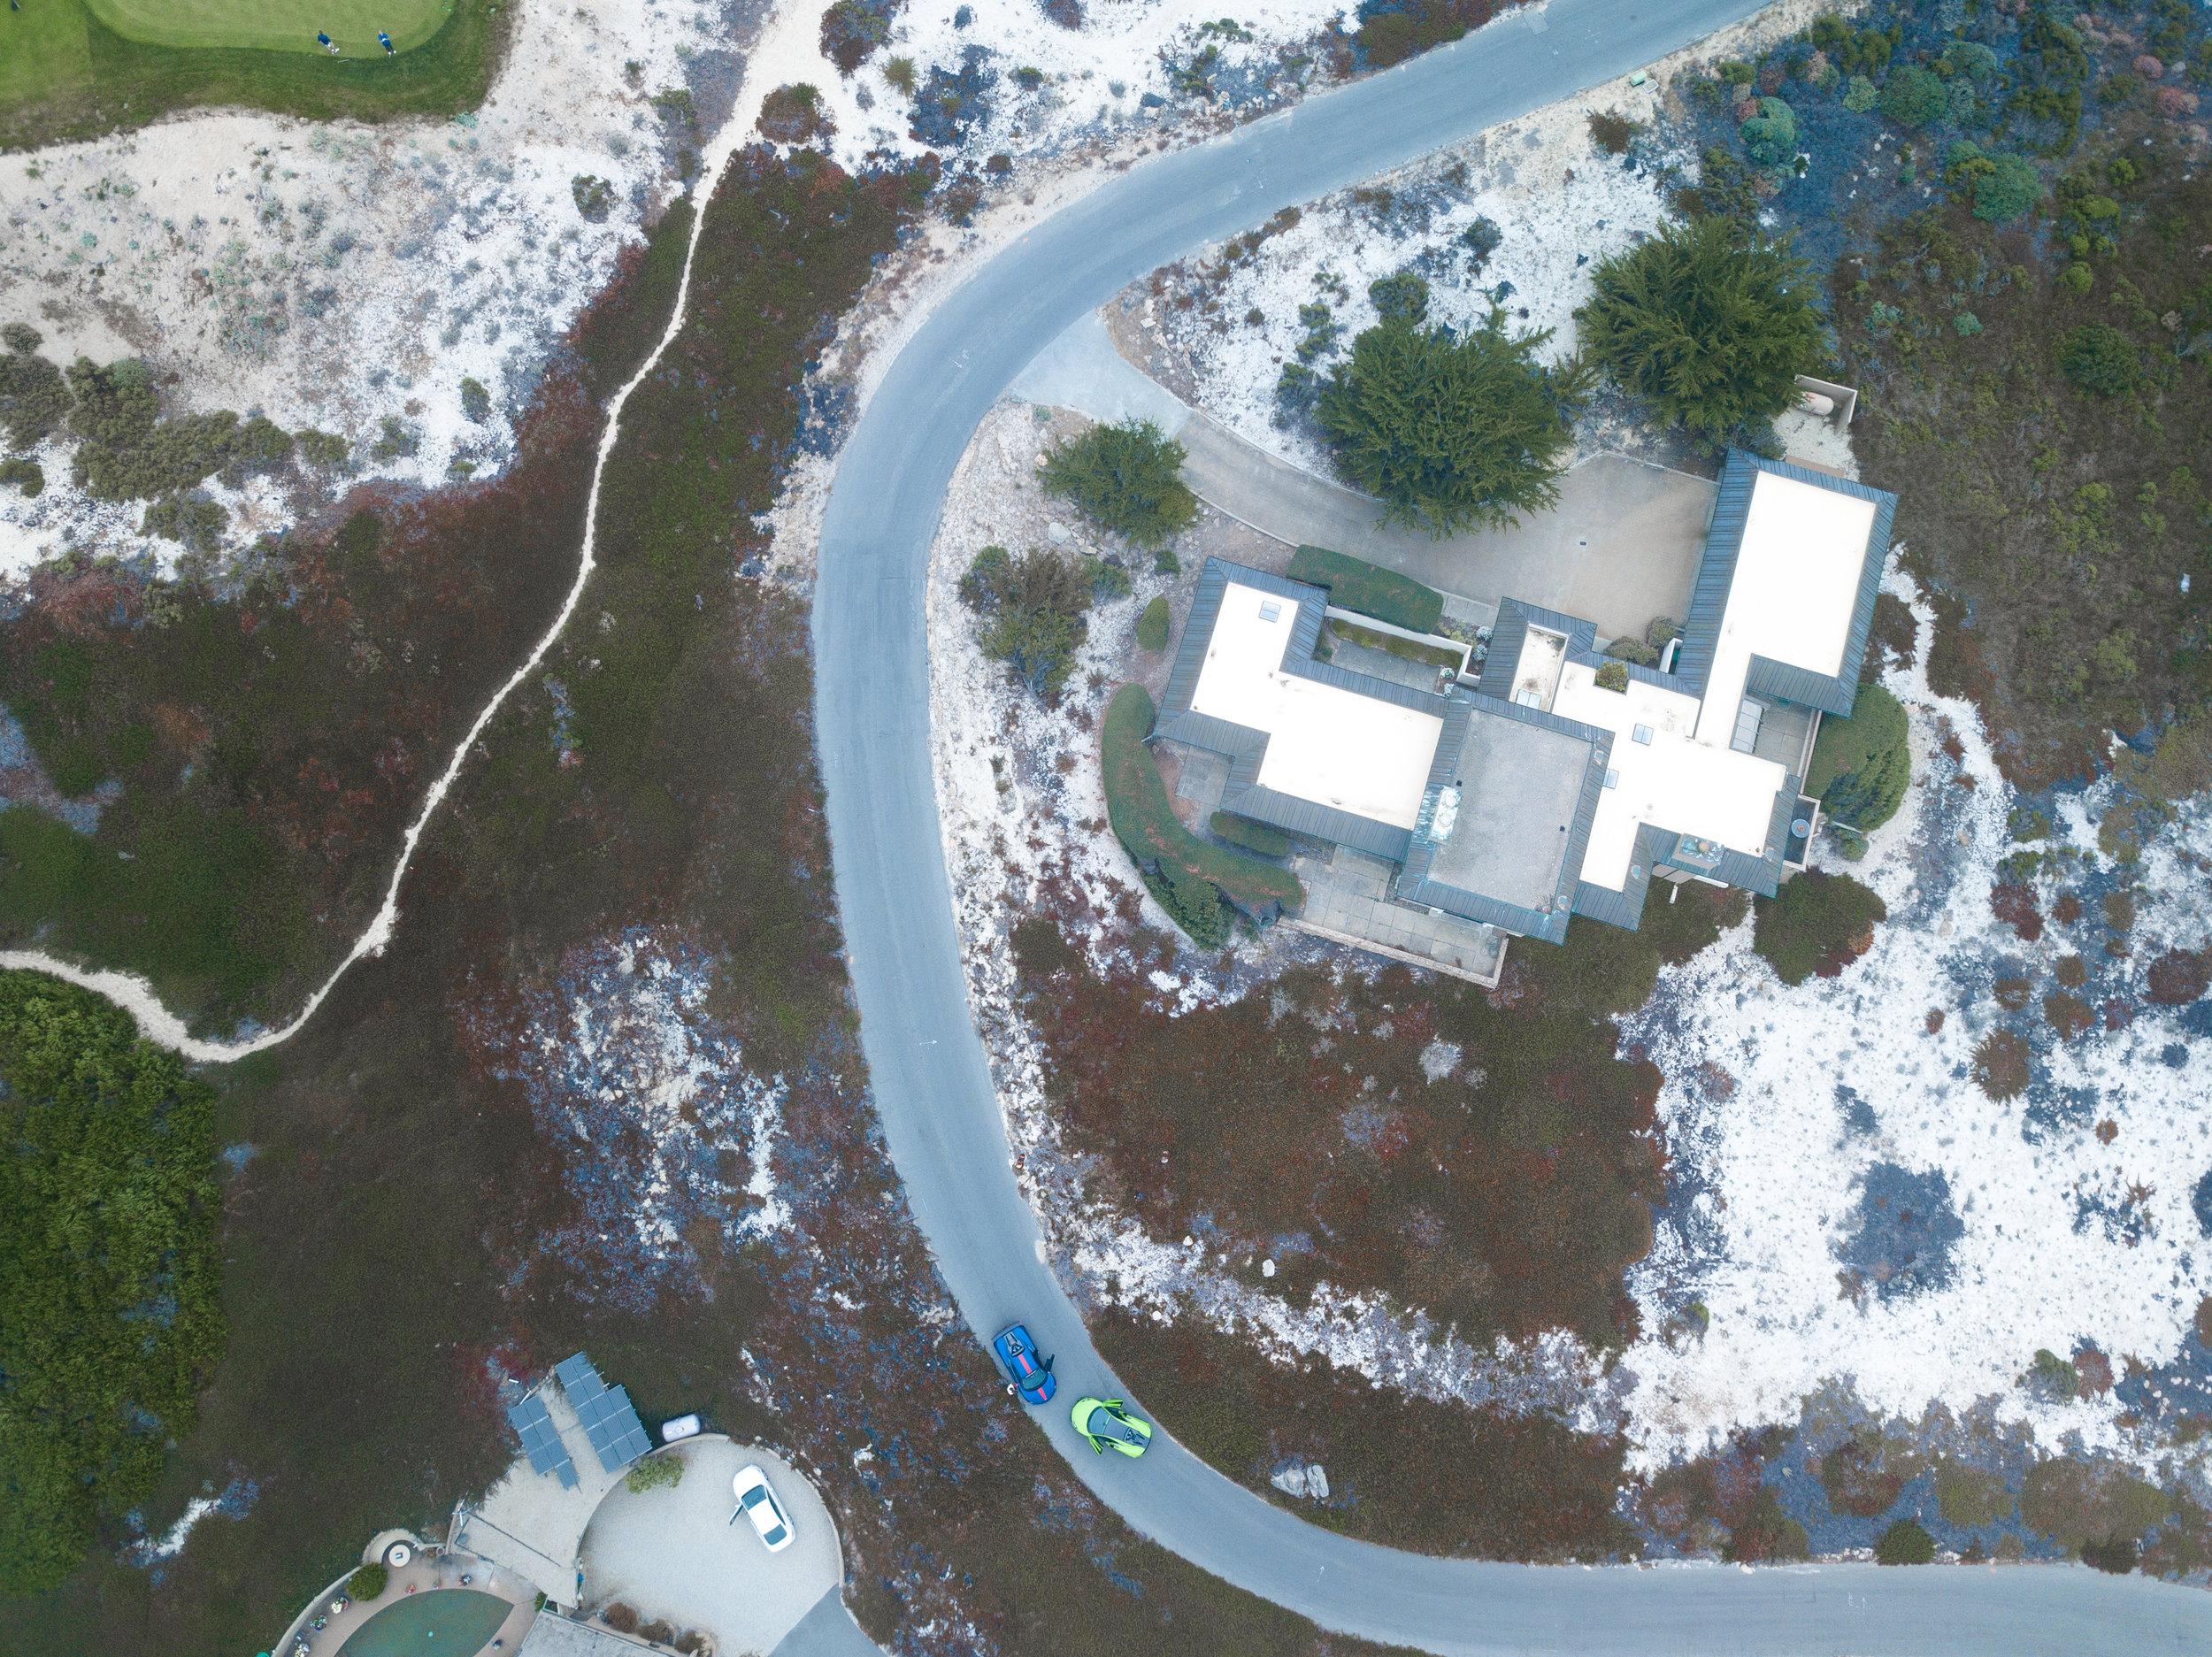 Stay_Driven_Monterey_Mclarens_DRONE-30.jpg